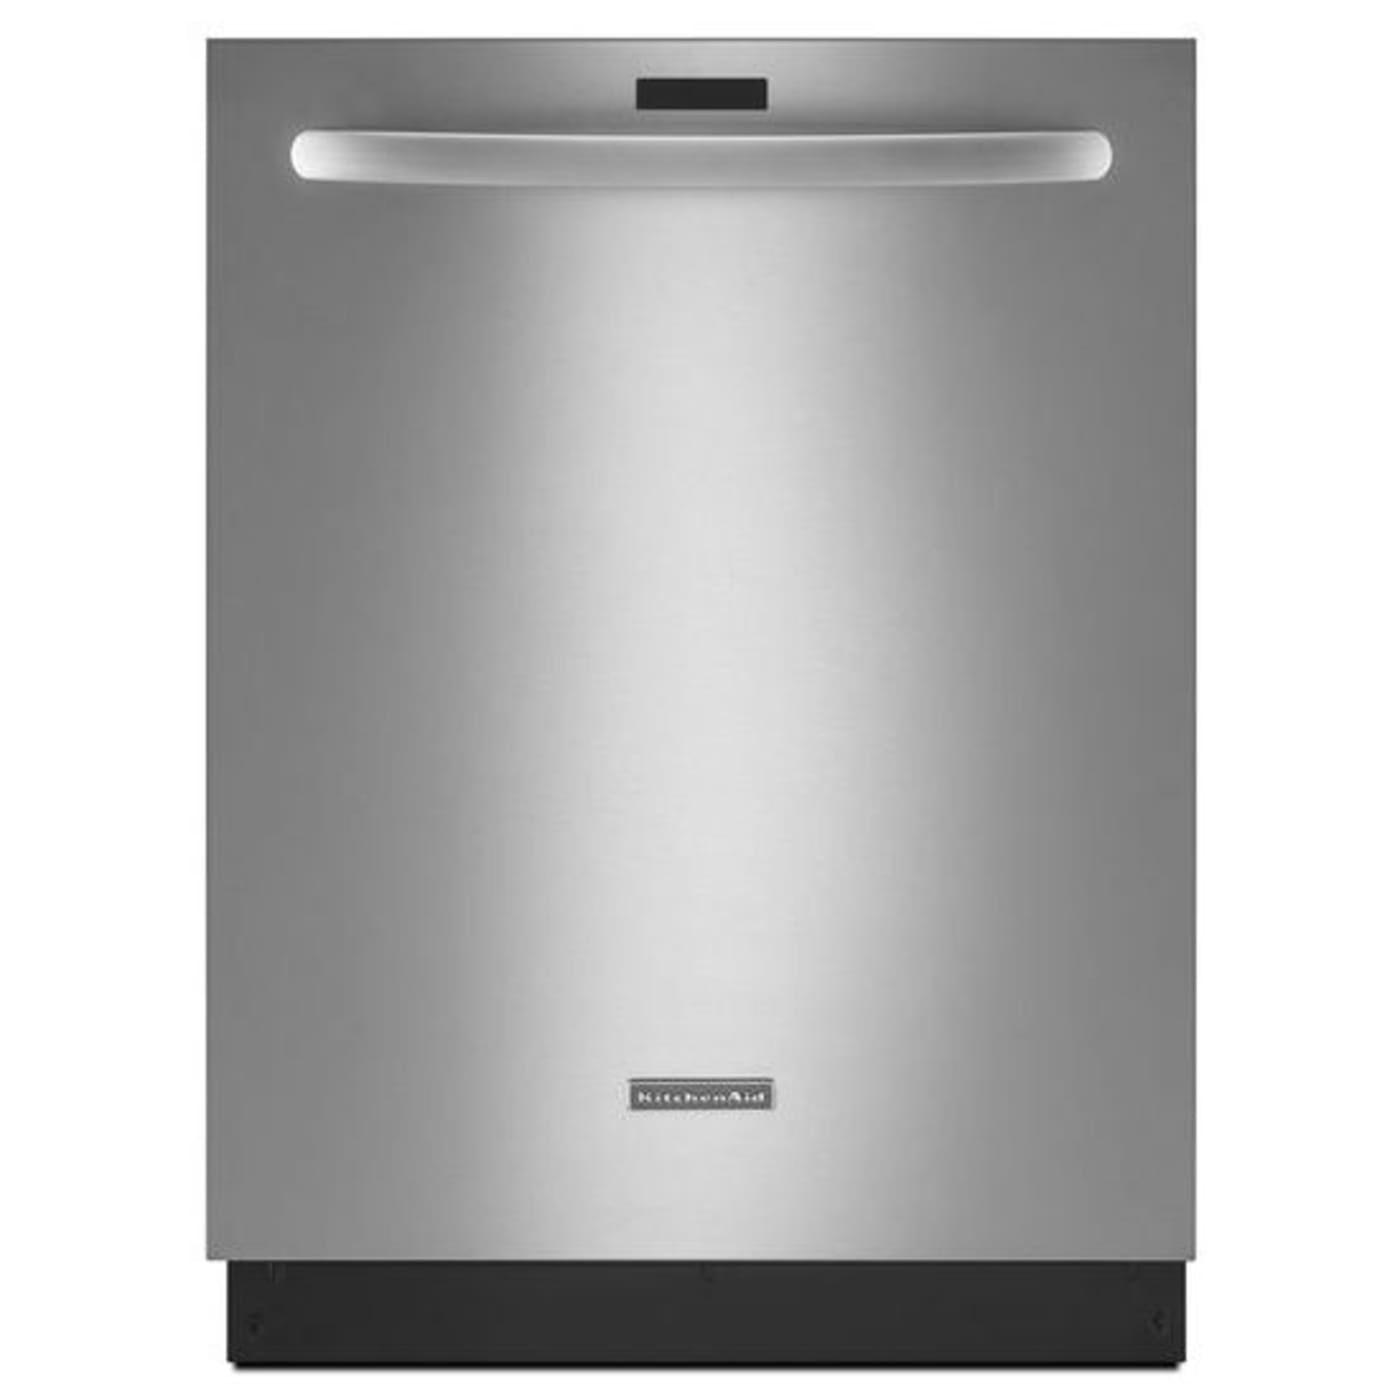 Kdtm354dss by kitchenaid fully integrated dishwashers